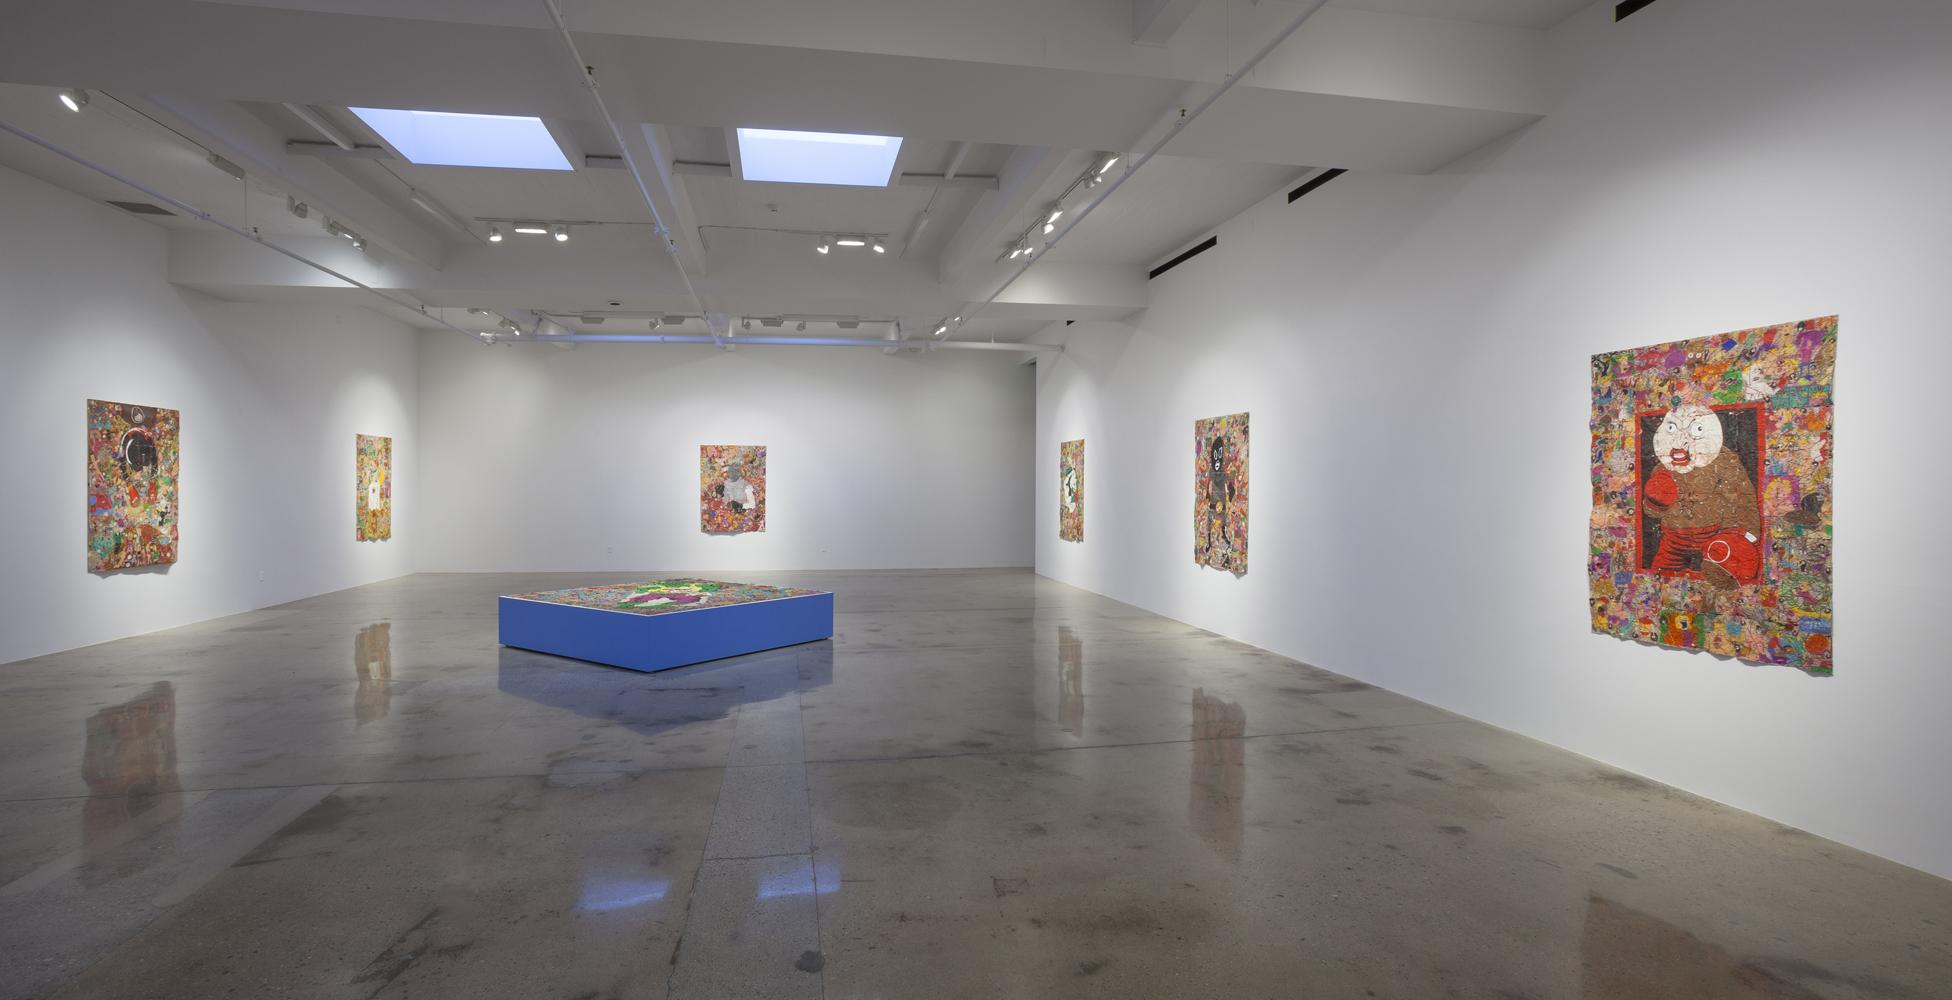 Camilo Restrepo, Steve Turner, Los Angeles, Medellín, Colombia, Colombian artist, Tight Rope, pastel on paper, contemporary colombian artist, contemporary art Colombia, contemporary art gallery los angeles